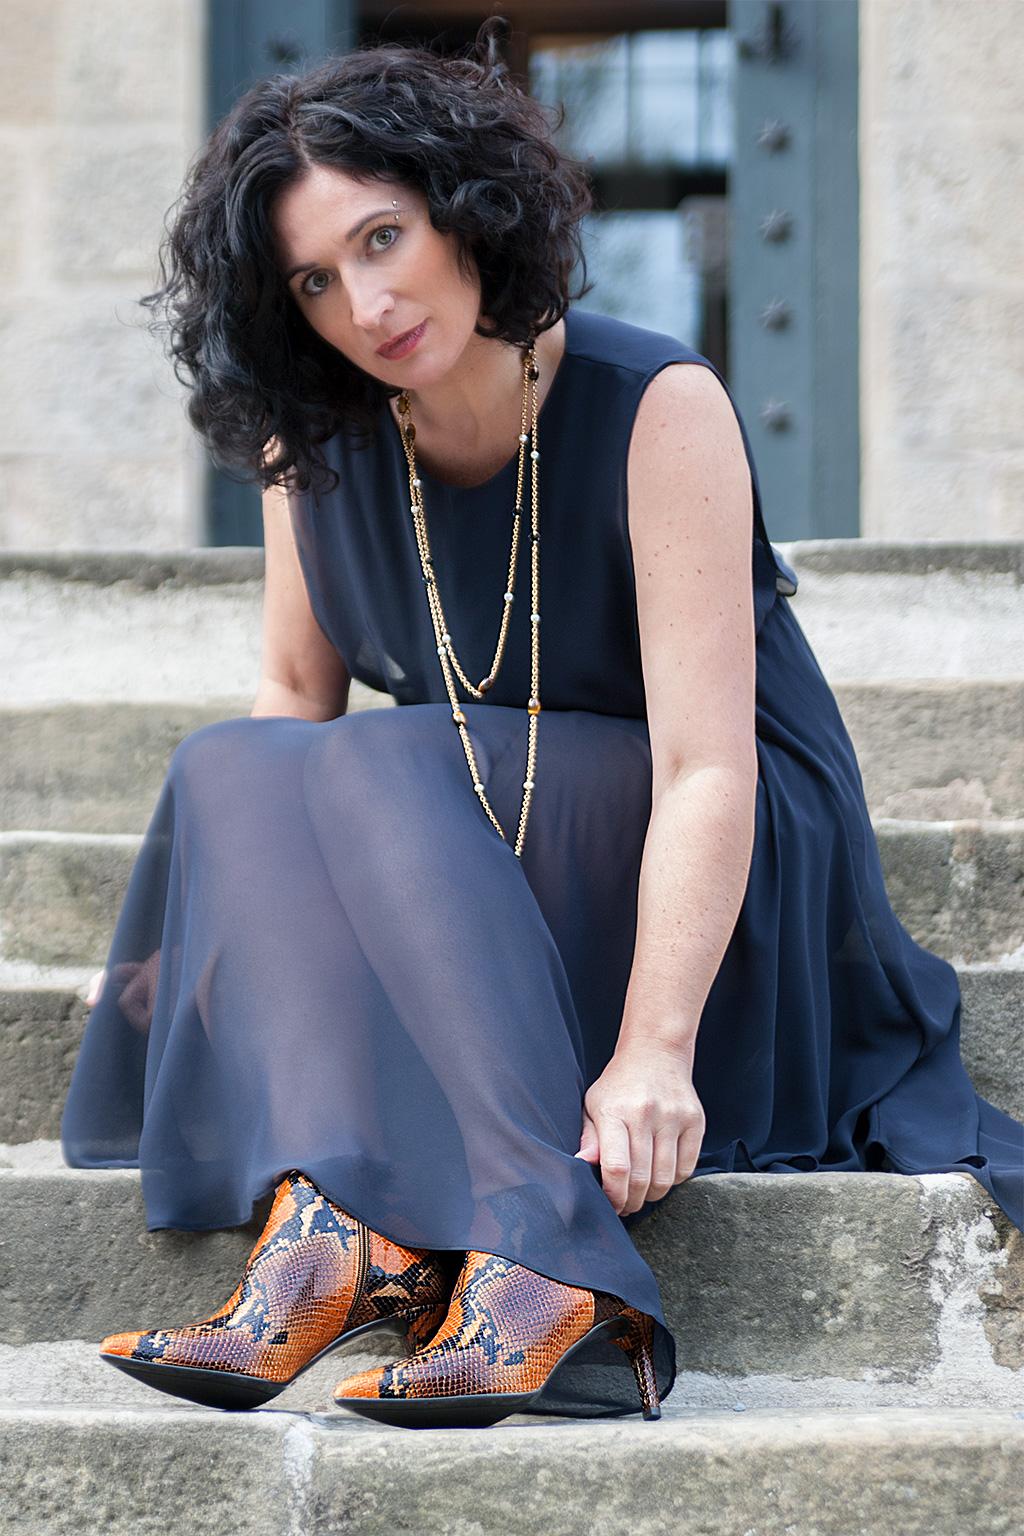 Virginia Errekalde posando para Muselines con vestido de Vuelve Marcela, joyas de Casa Munoa y calzado Ainhoa Etxeberría - The Shoe Boutique.